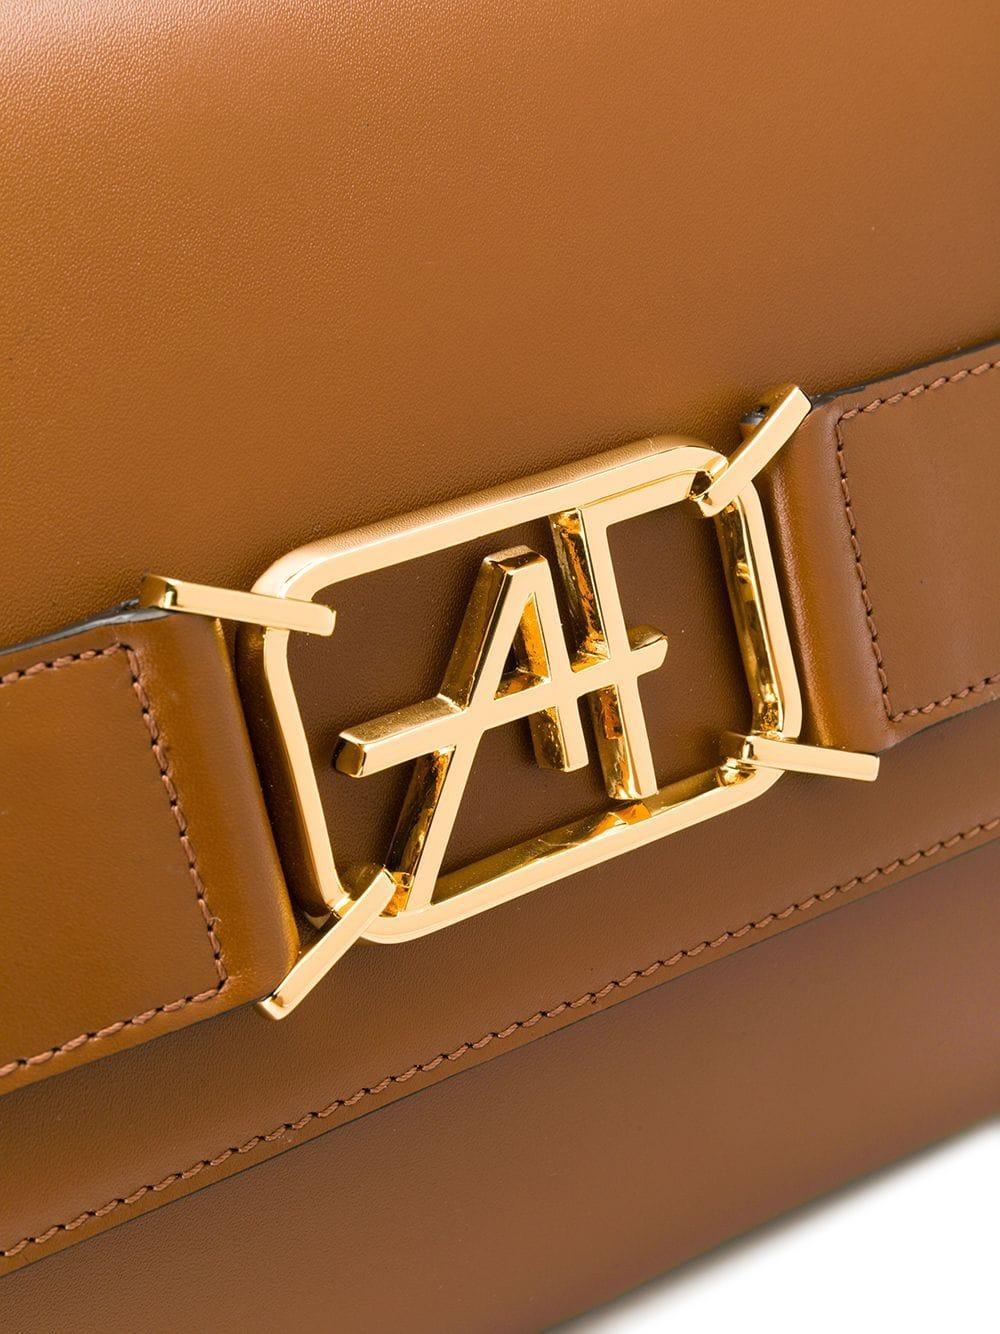 Alberta Ferretti Leder Mini Handtasche in Braun p7gFN